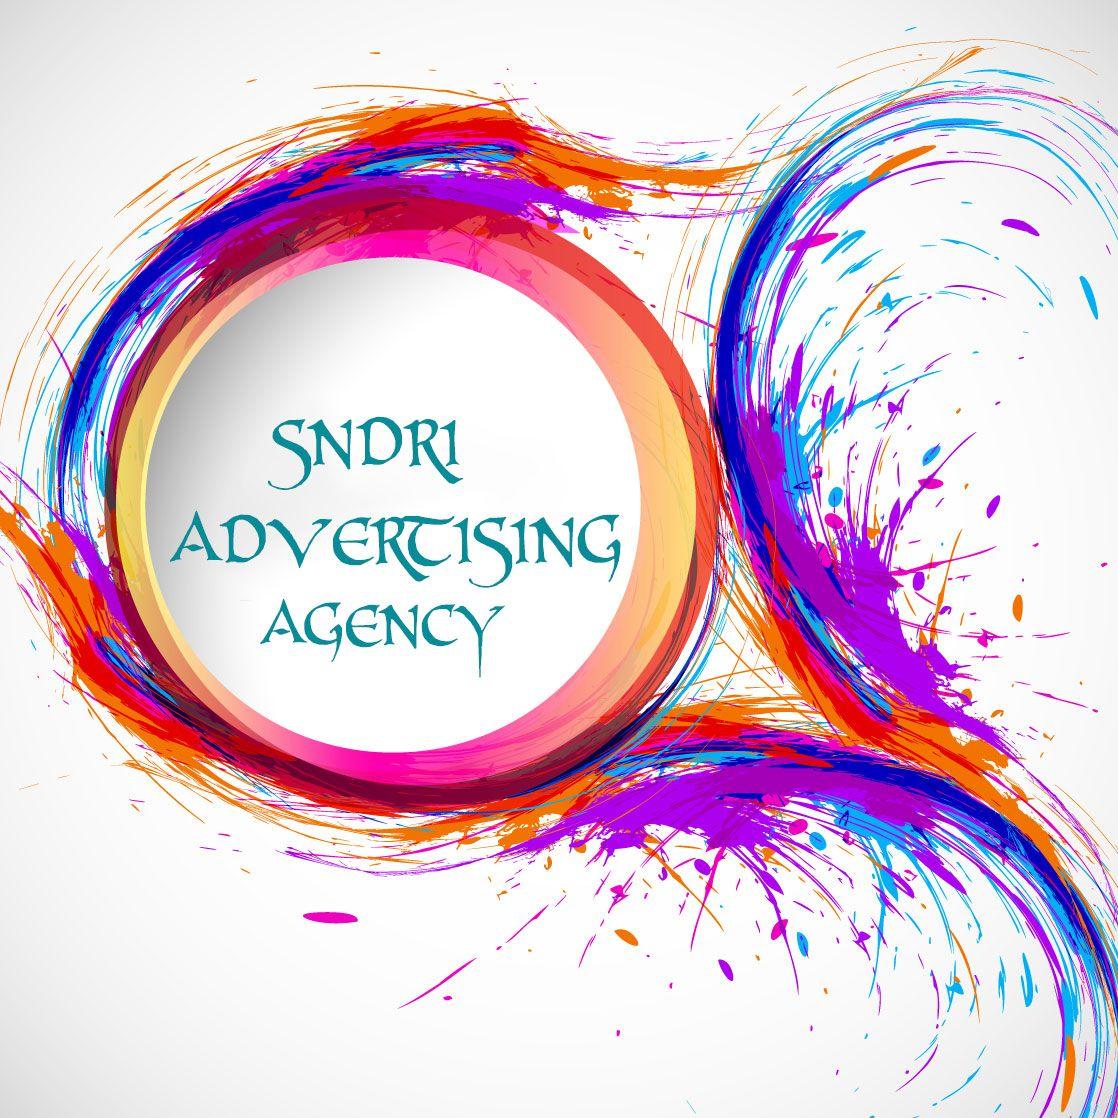 Advertising Agency Jeddah Saudi Arabia Advertising Company ...